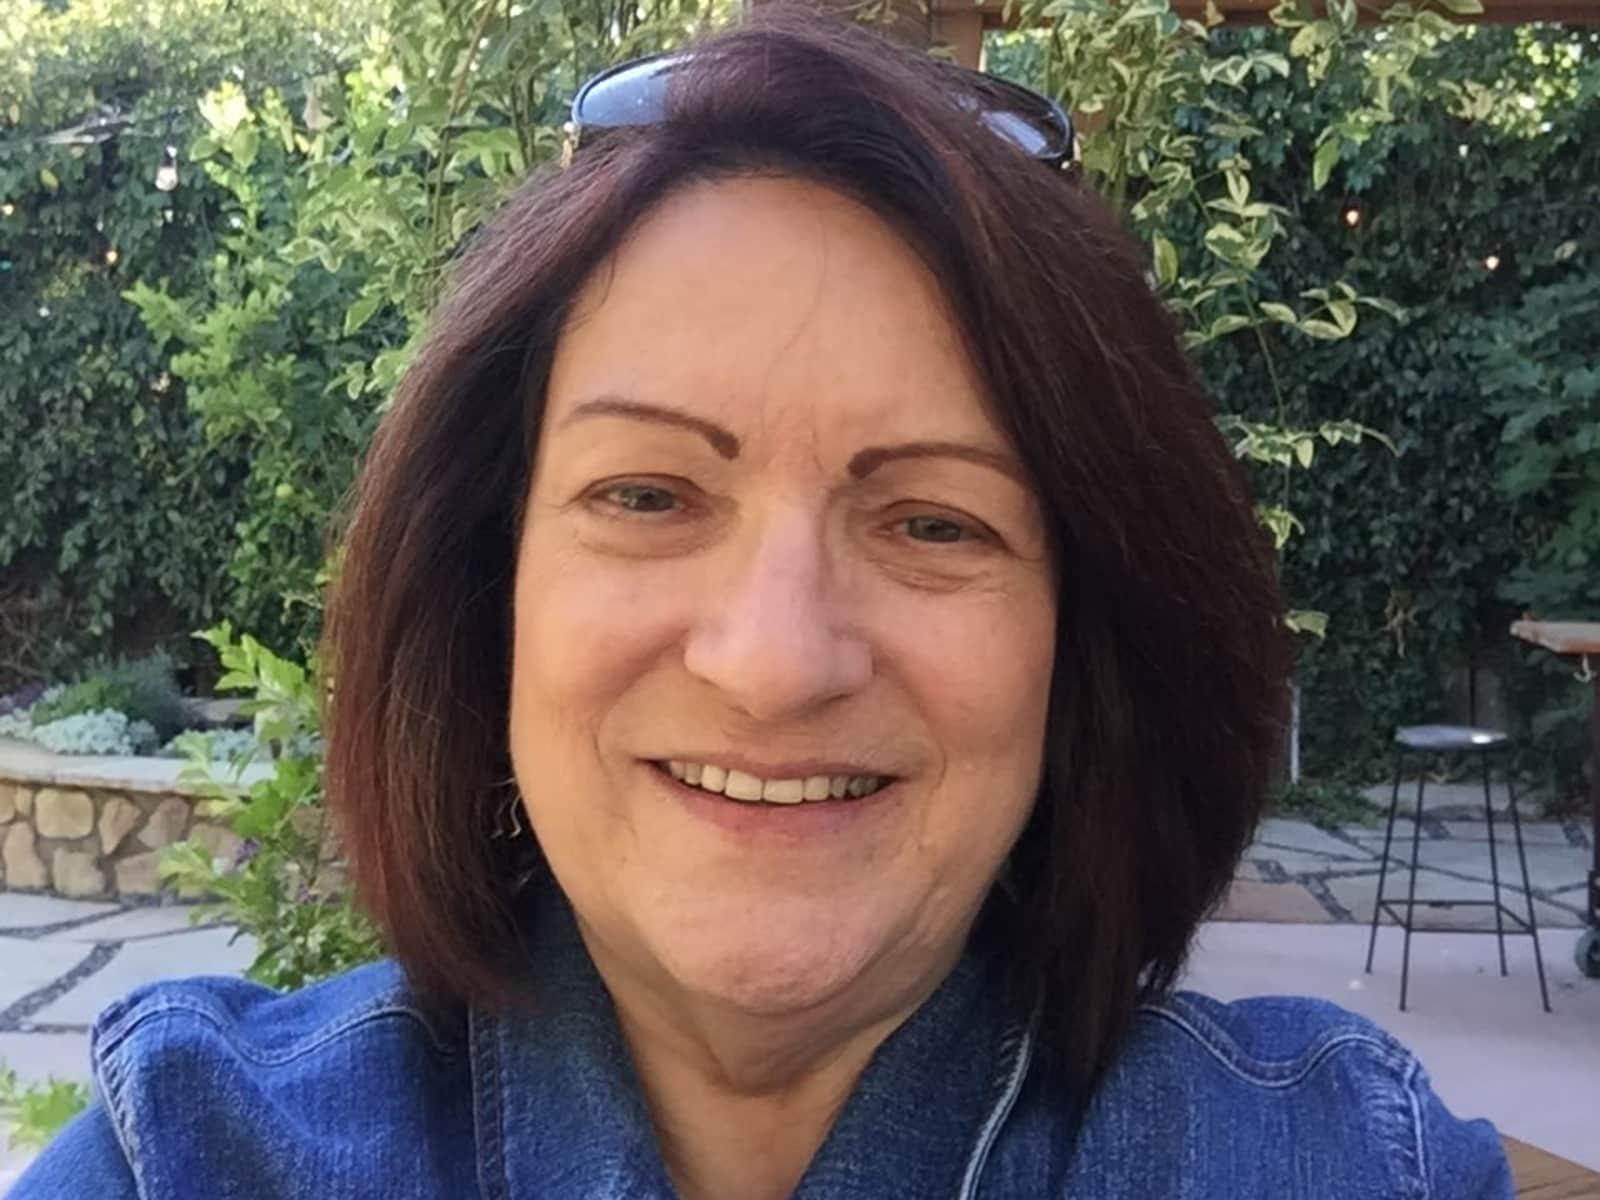 Carol from Las Vegas, Nevada, United States